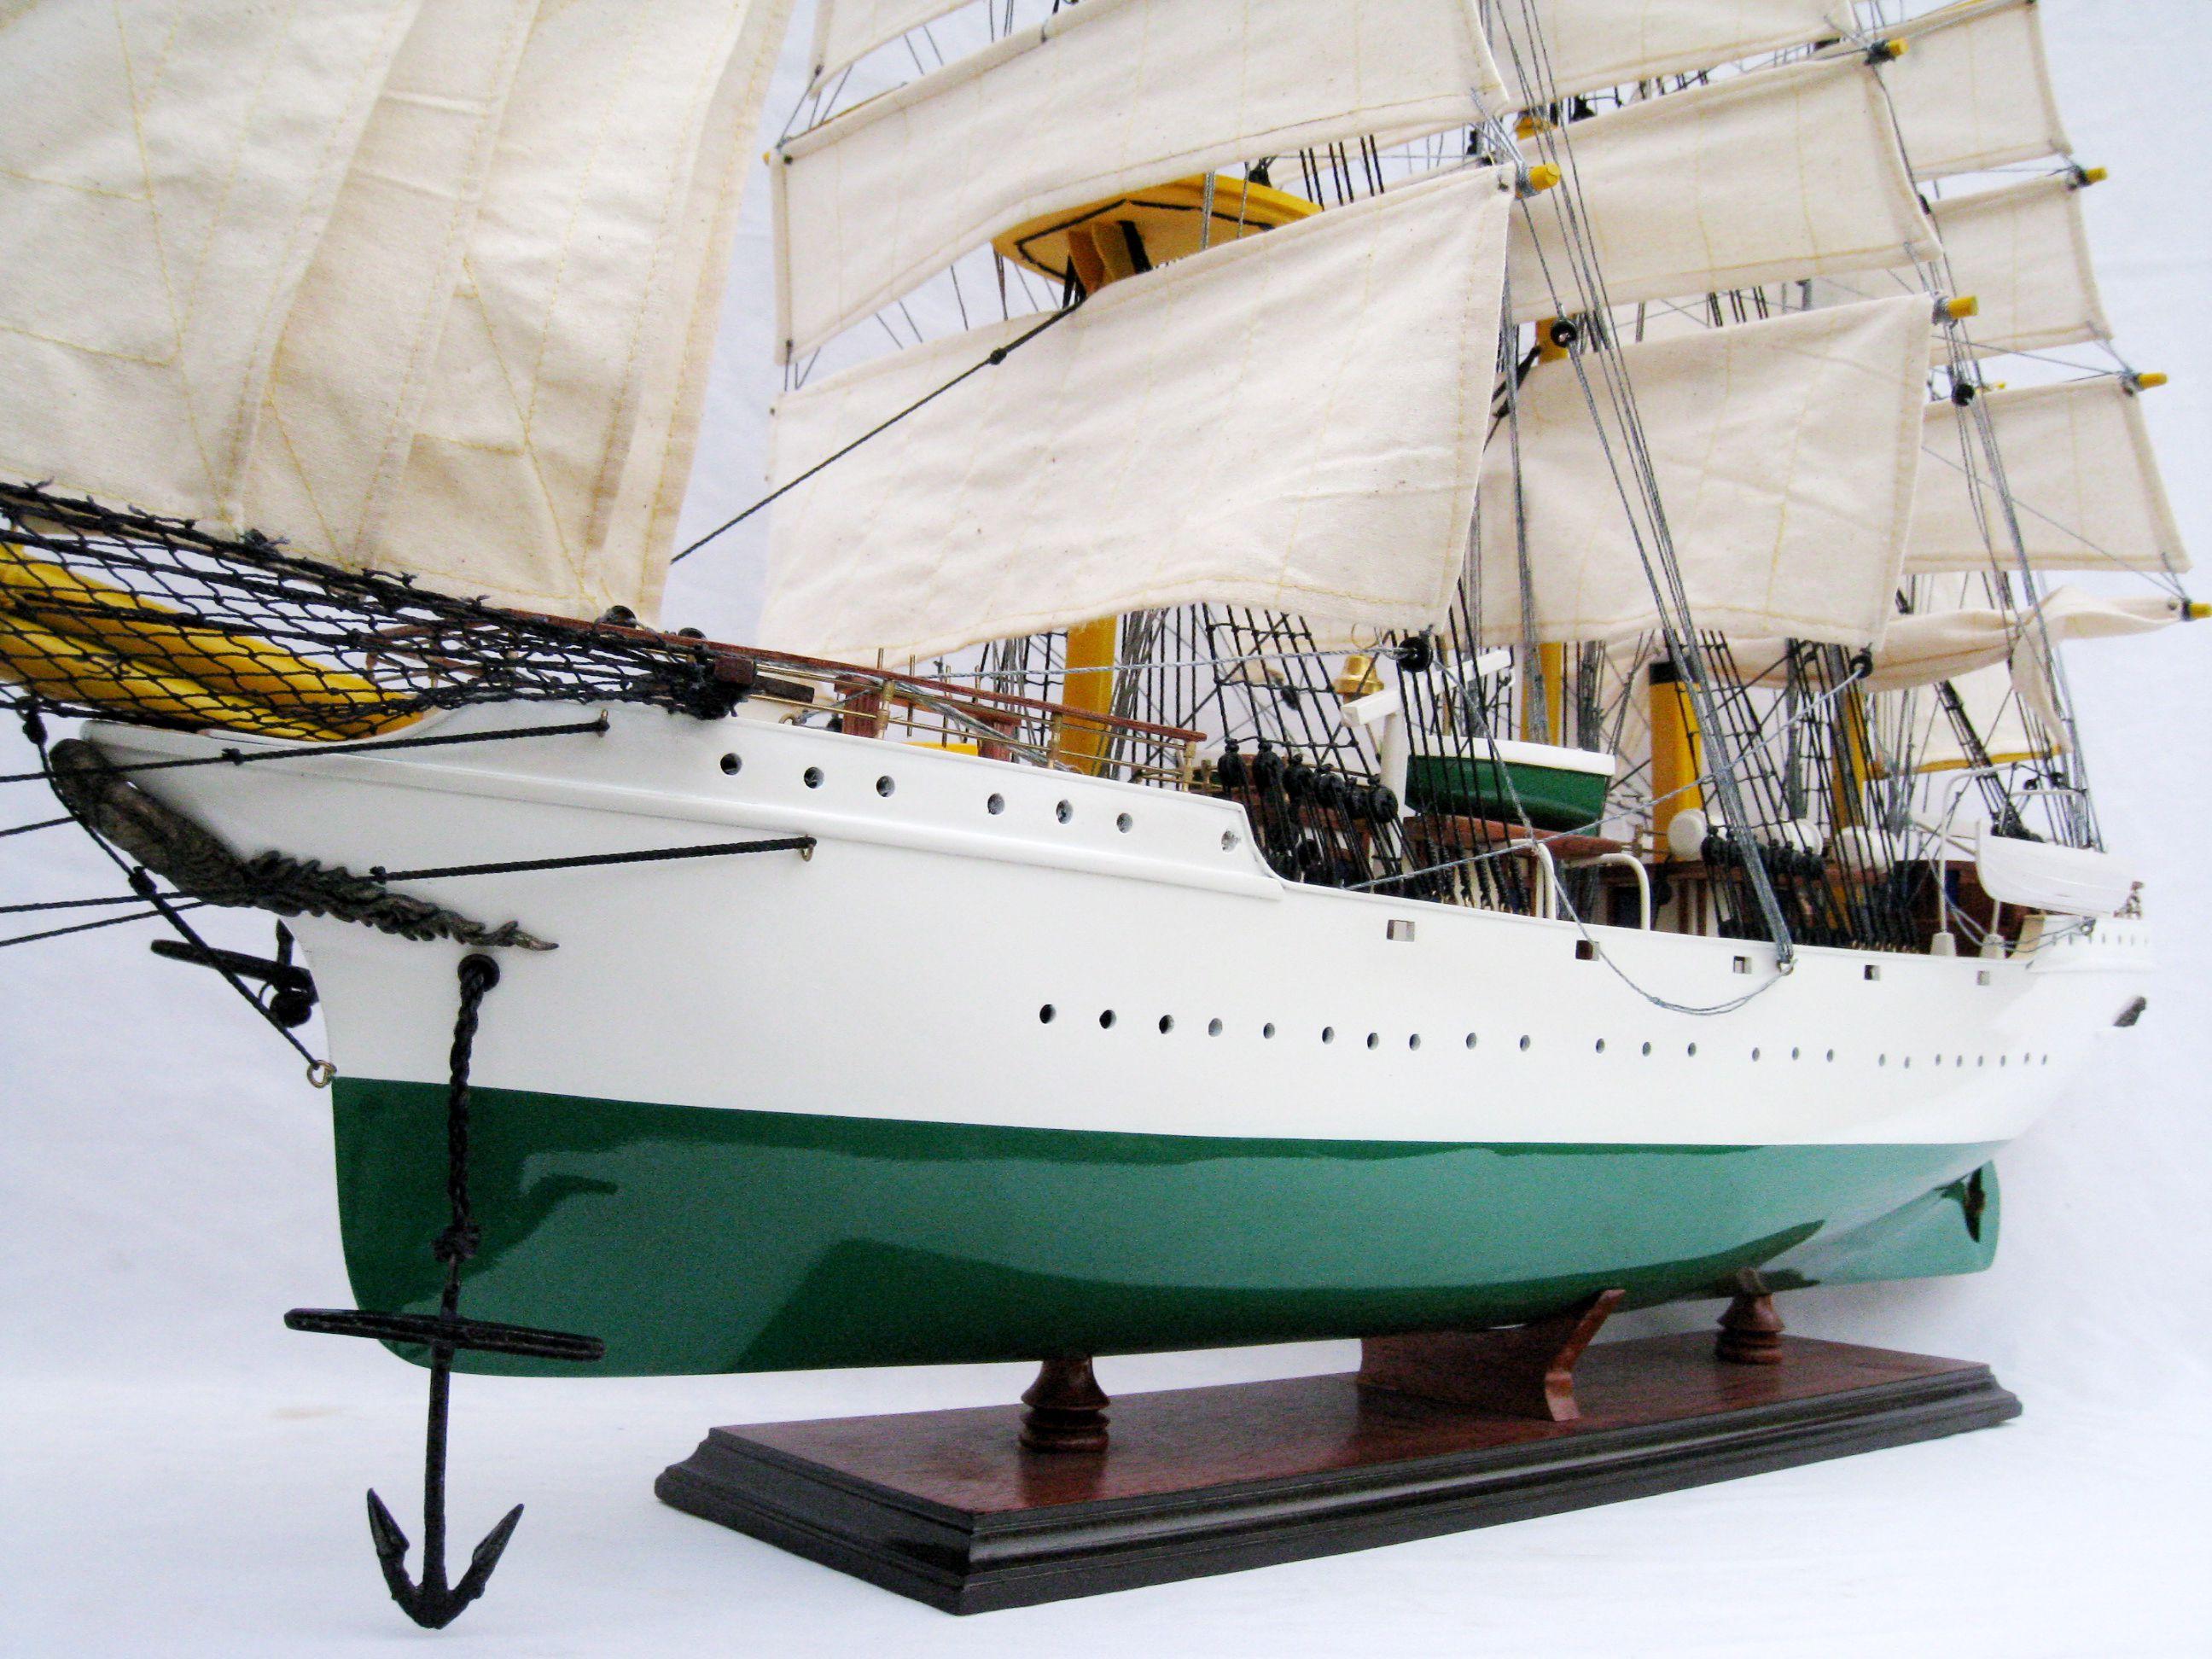 Danmark Ship Model - GN (TS0018P-70)